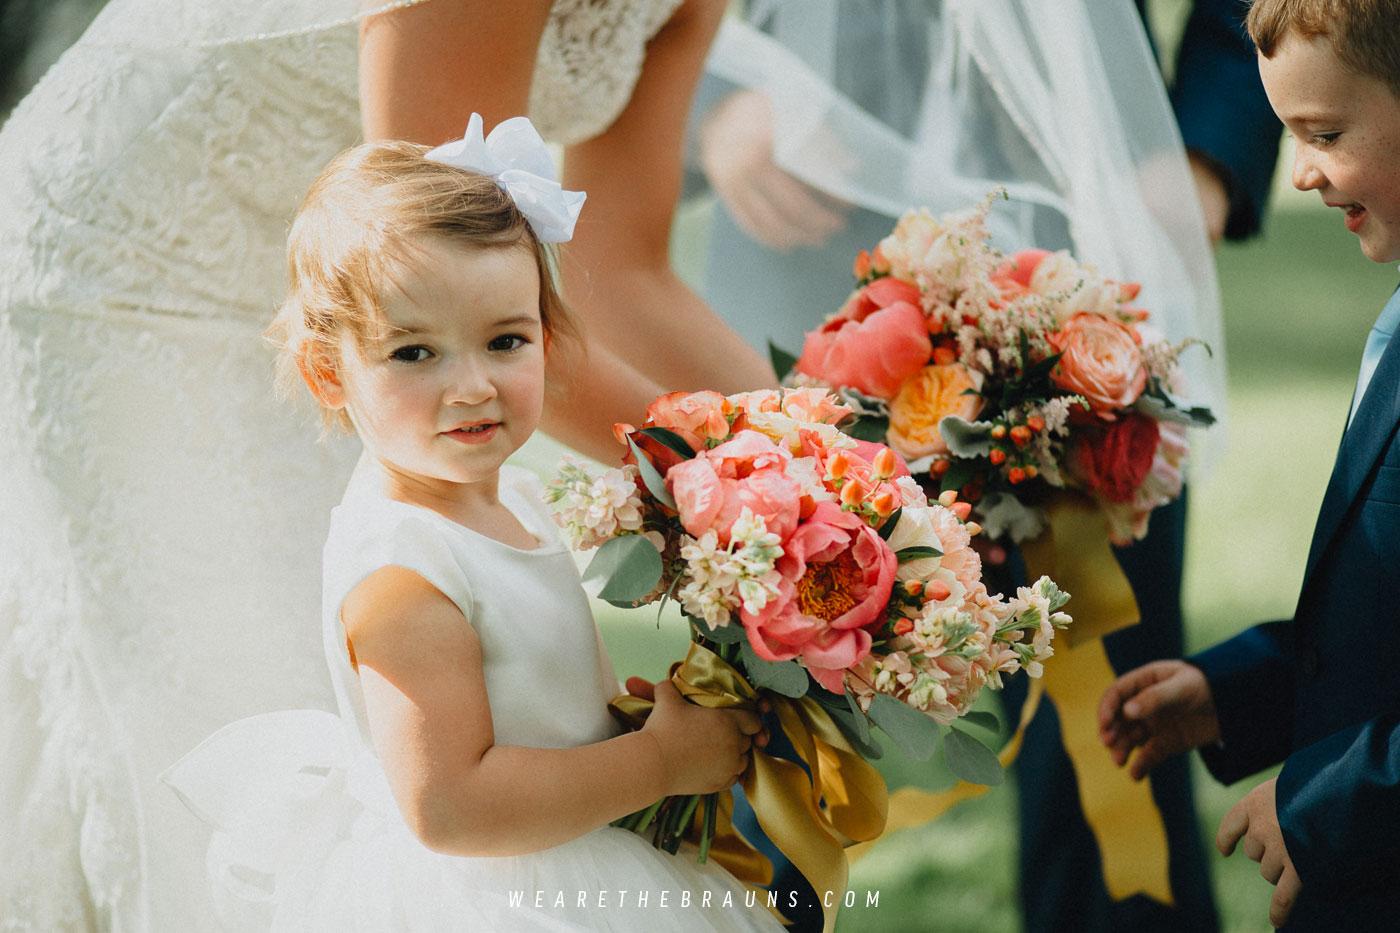 Stephanie-Ryan-Bridal-Party-084.jpg